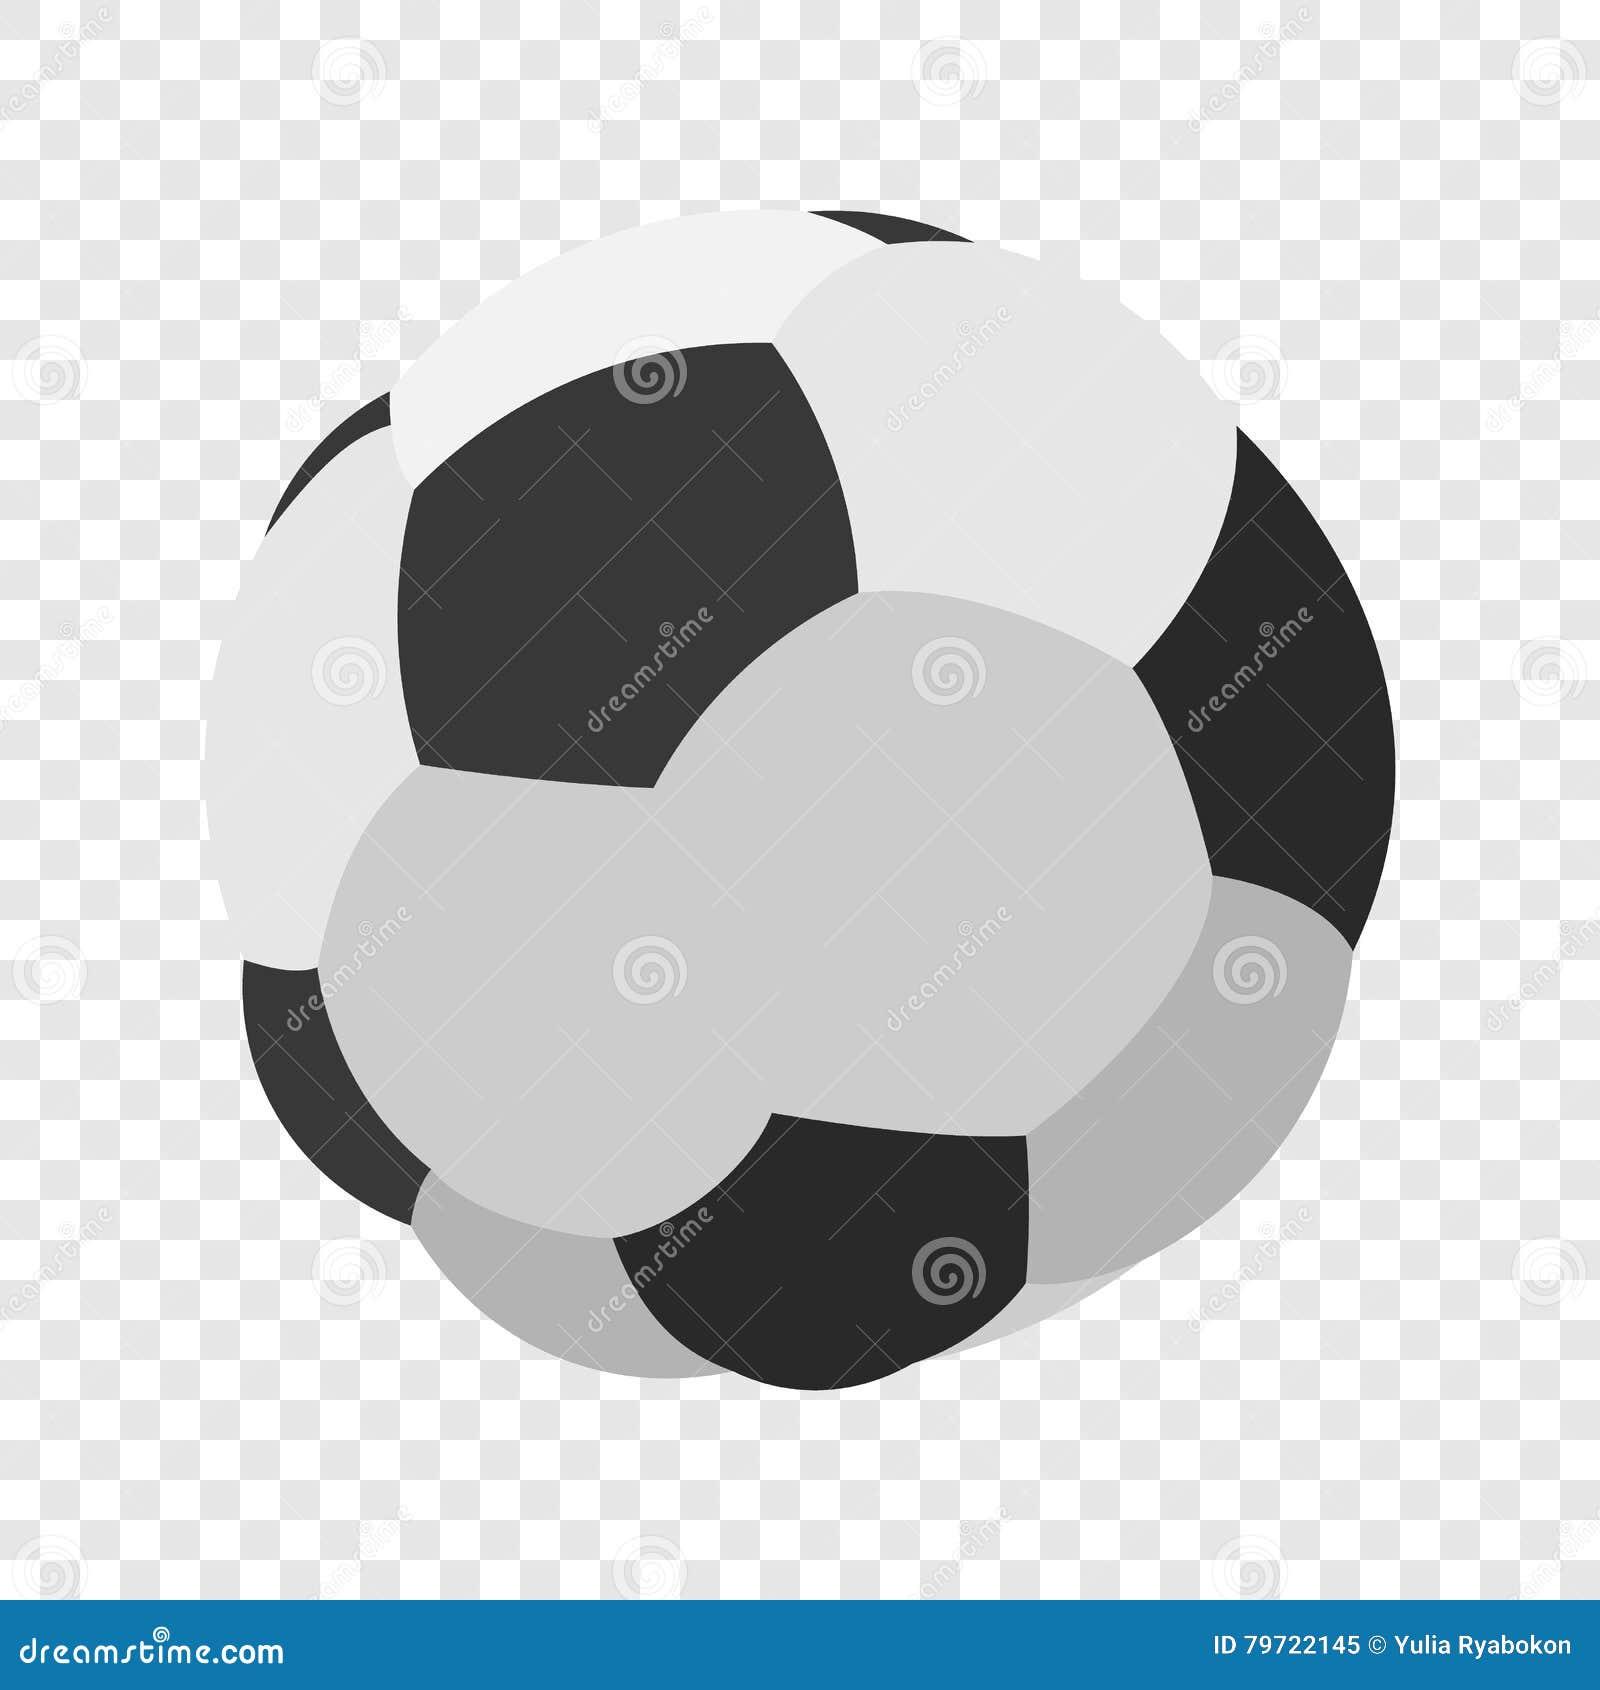 Soccer Or Football Cartoon Image Stock Vector Illustration Of